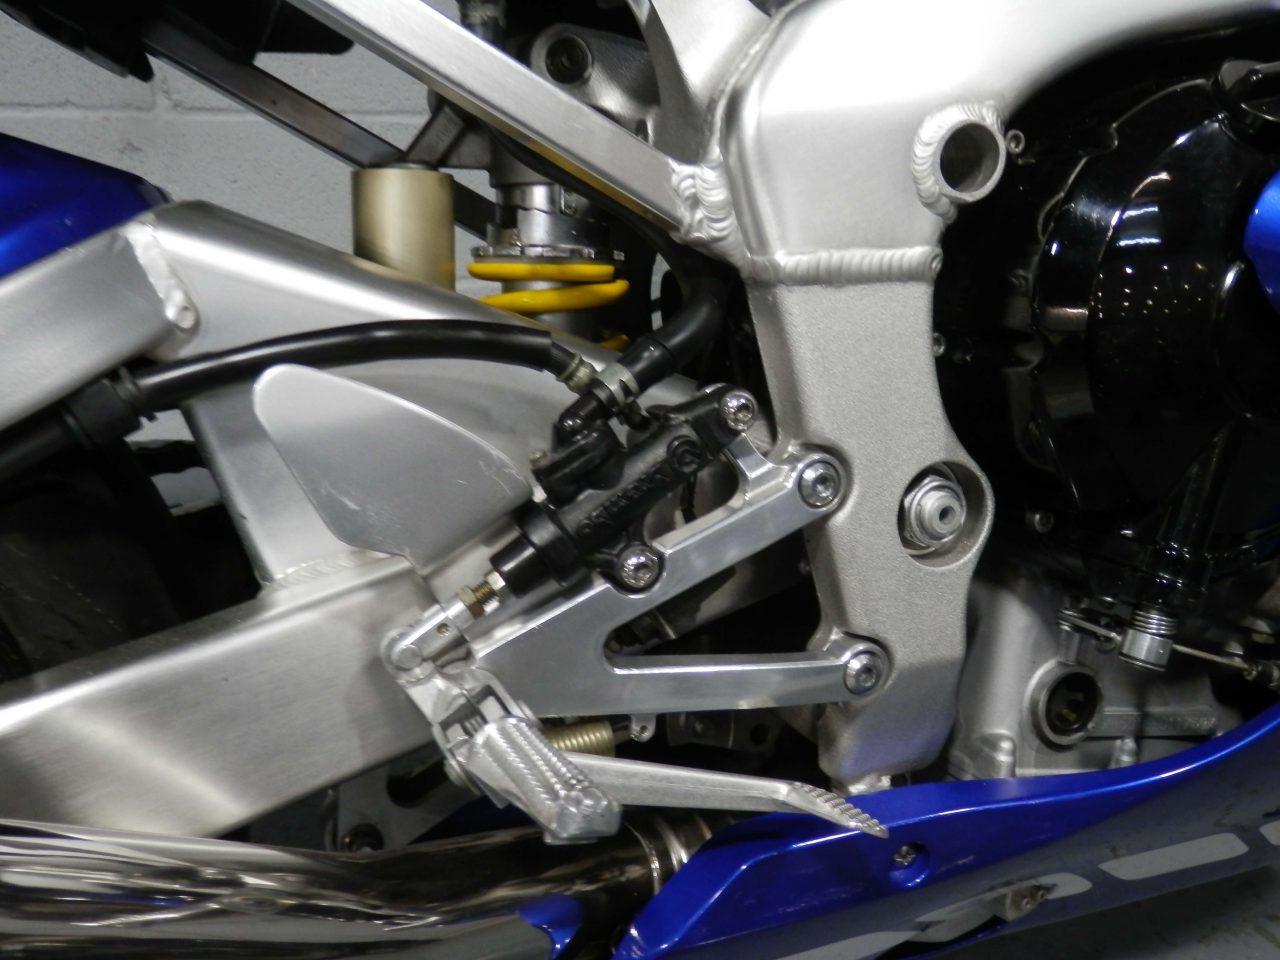 Yamaha YZF R1 1000